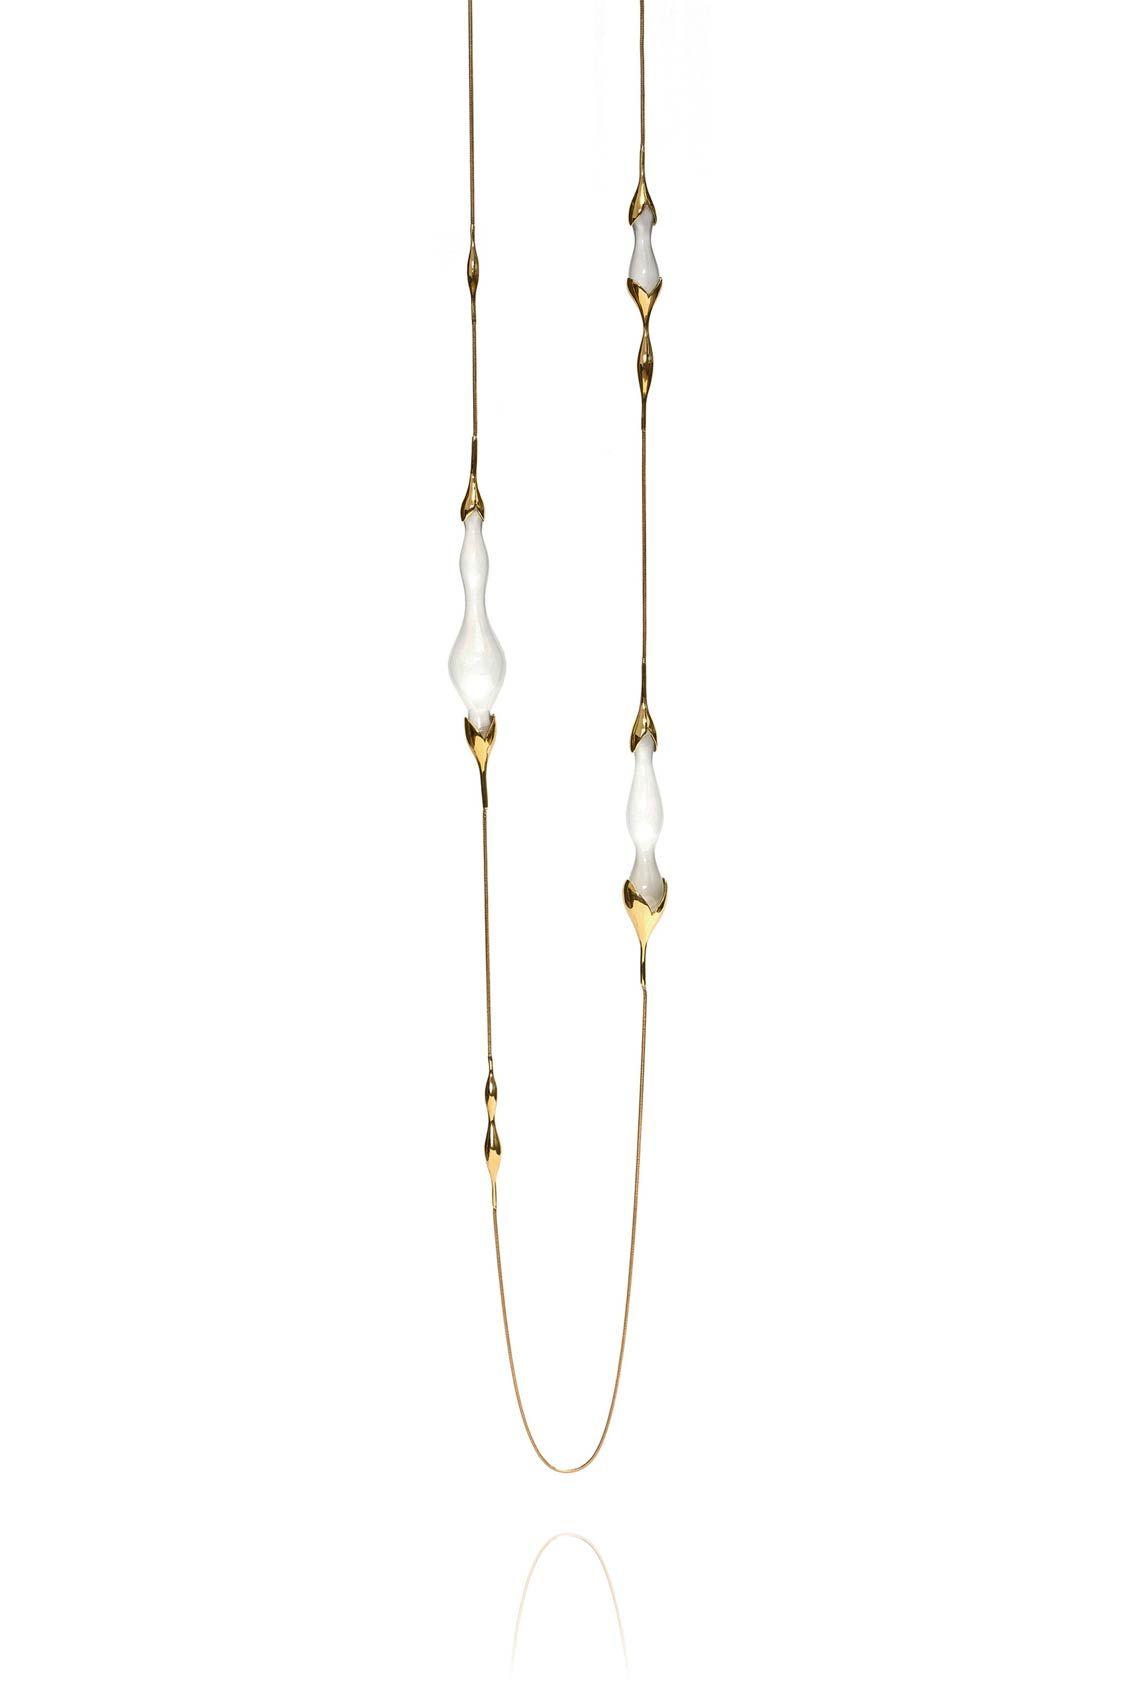 pingl par white bird sur designers fernando jorge pinterest bijoux. Black Bedroom Furniture Sets. Home Design Ideas